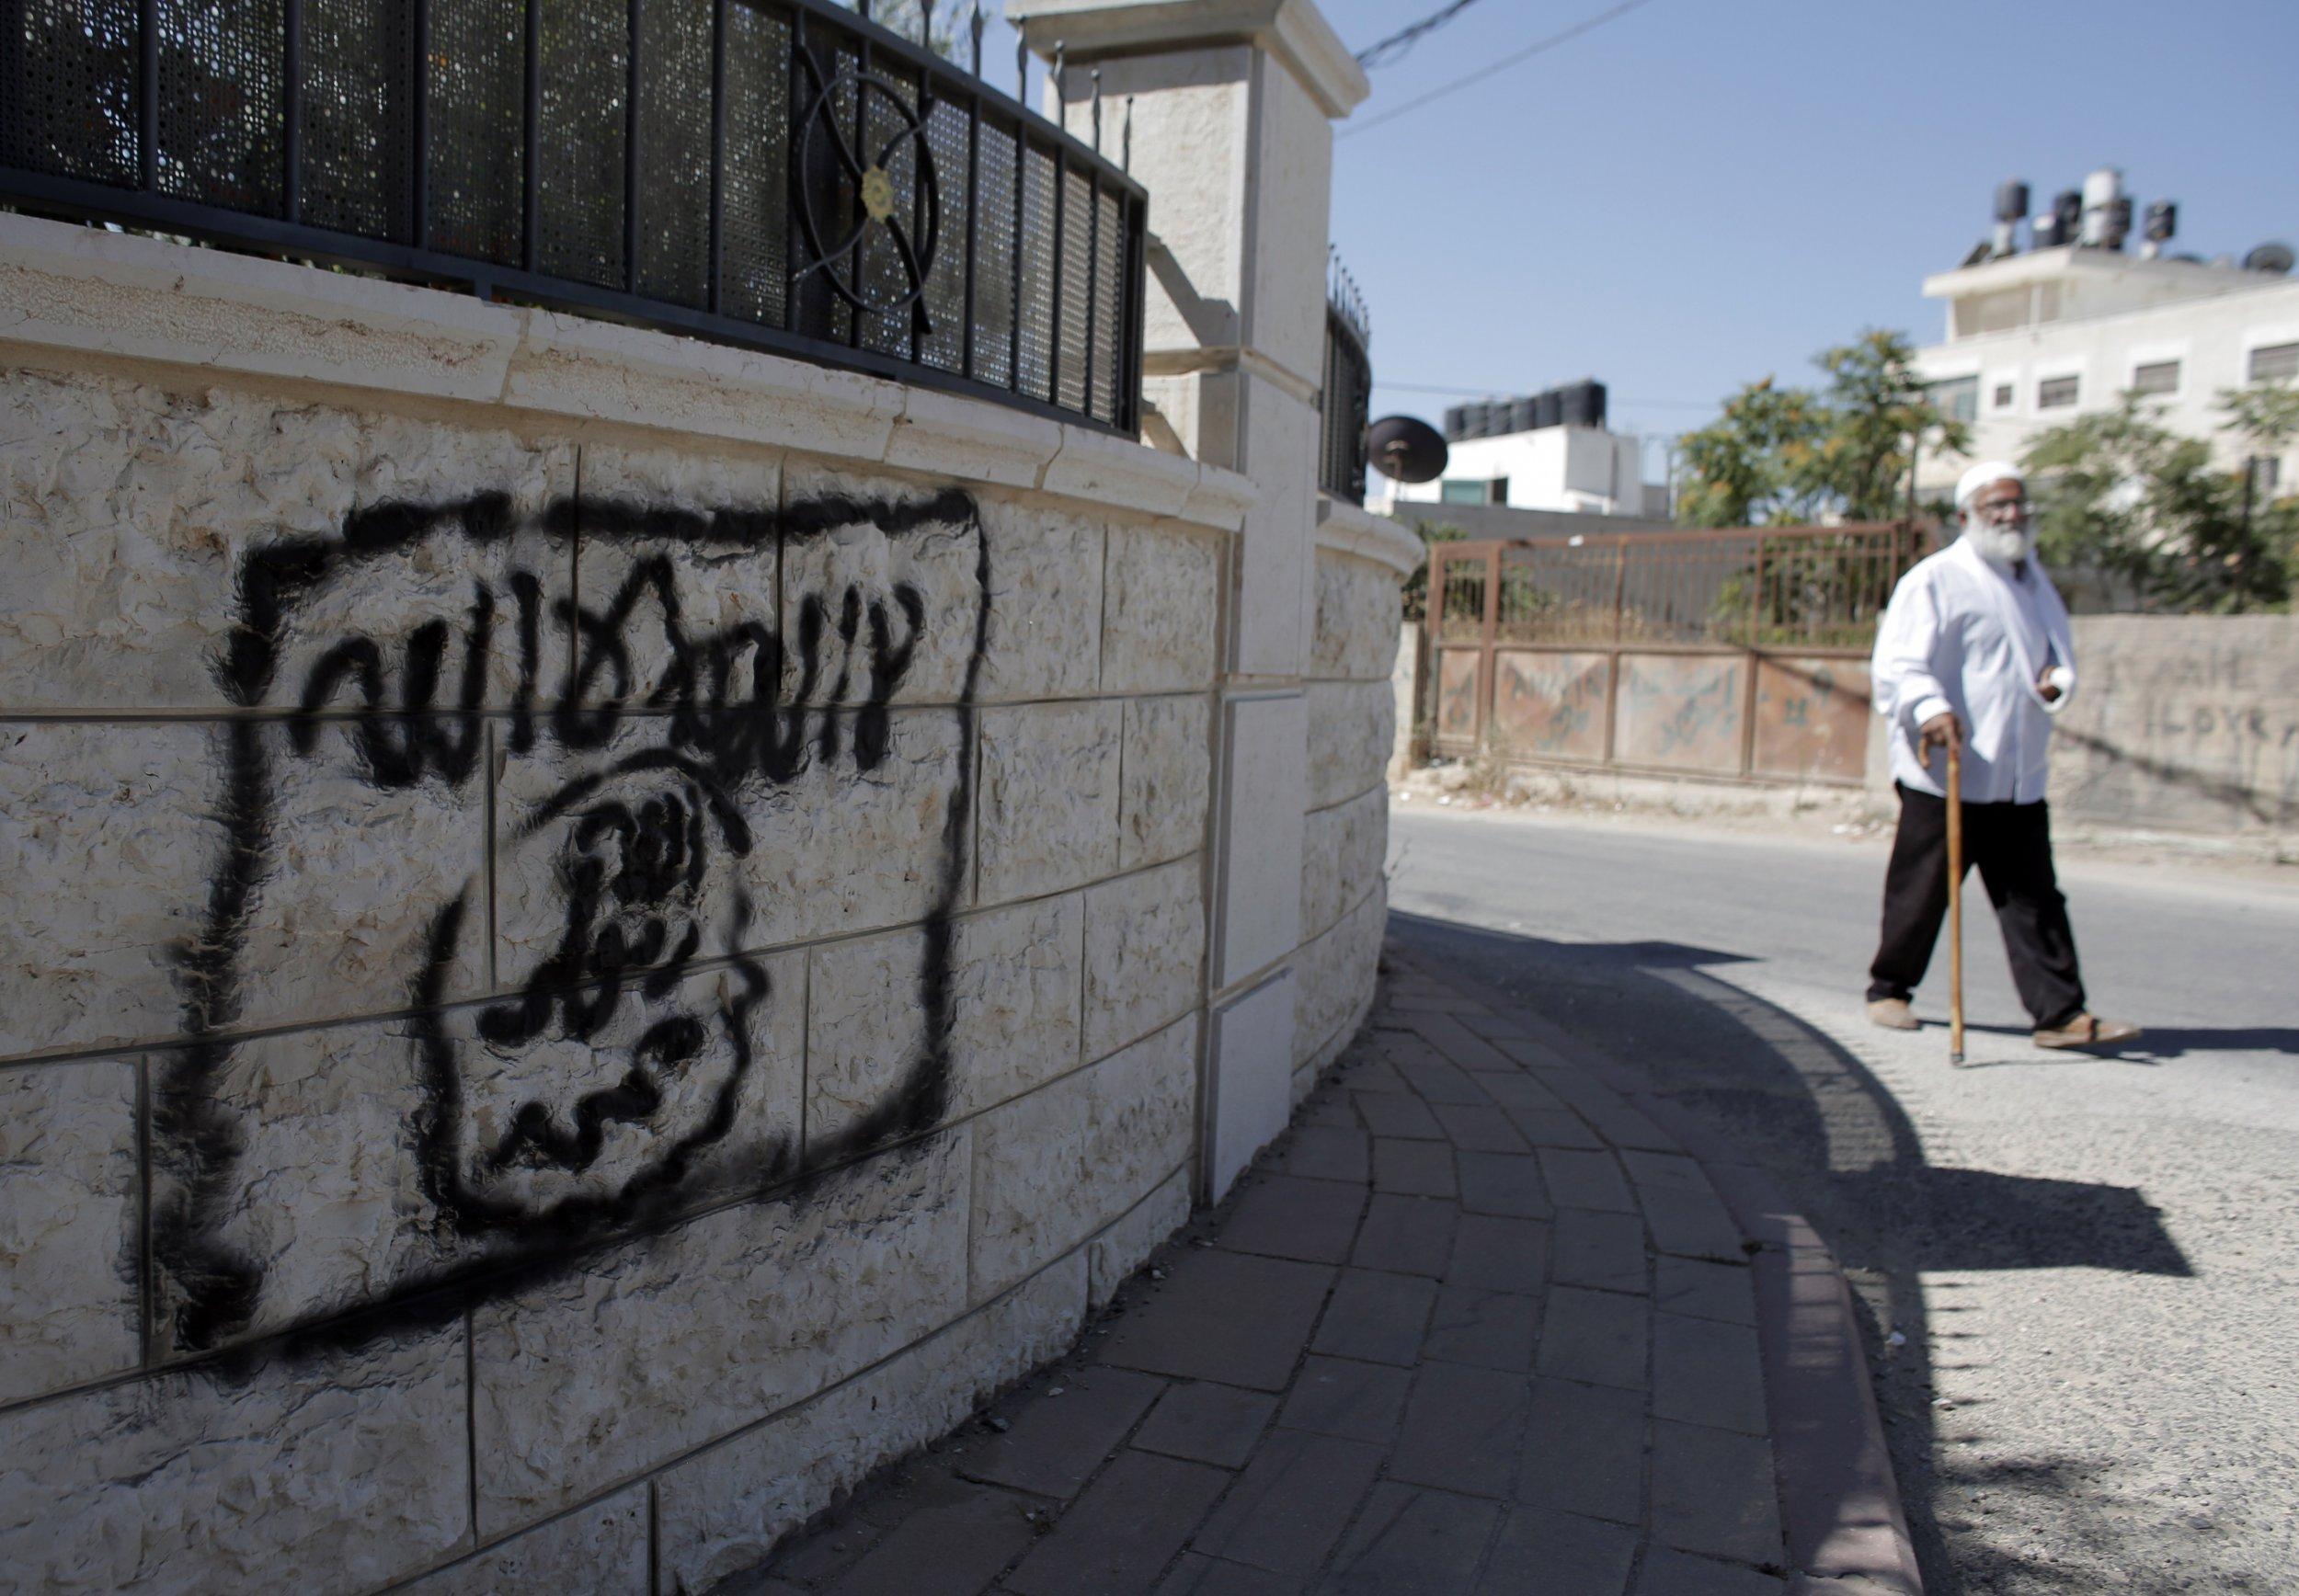 ISIS graffiti in East Jerusalem